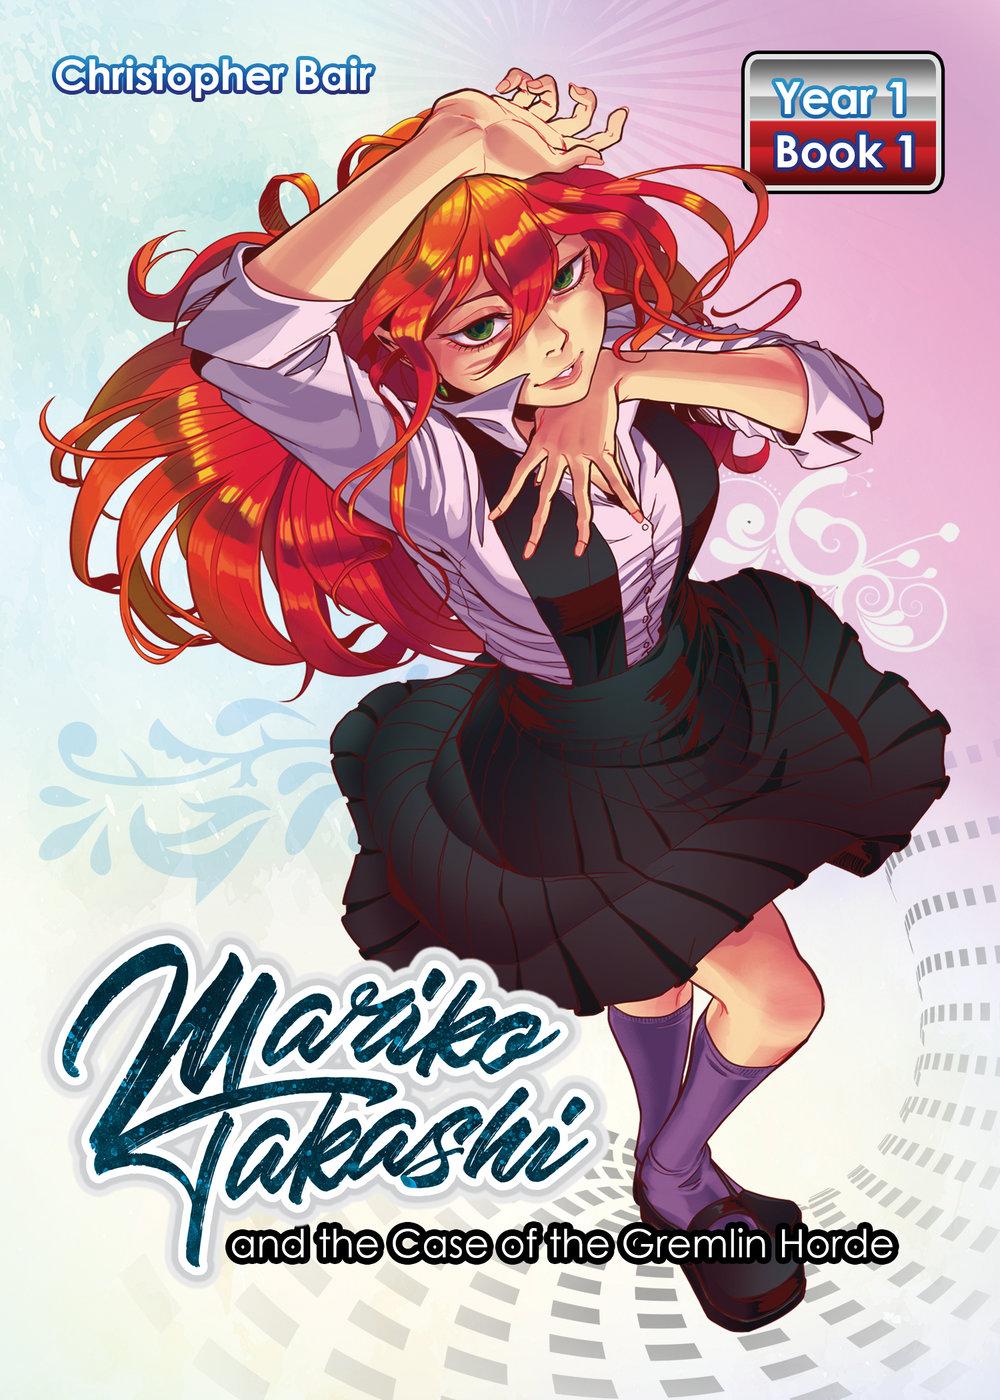 Mariko-Takashi-Cover-1-1-2ndEd-frontcoveronly.jpg